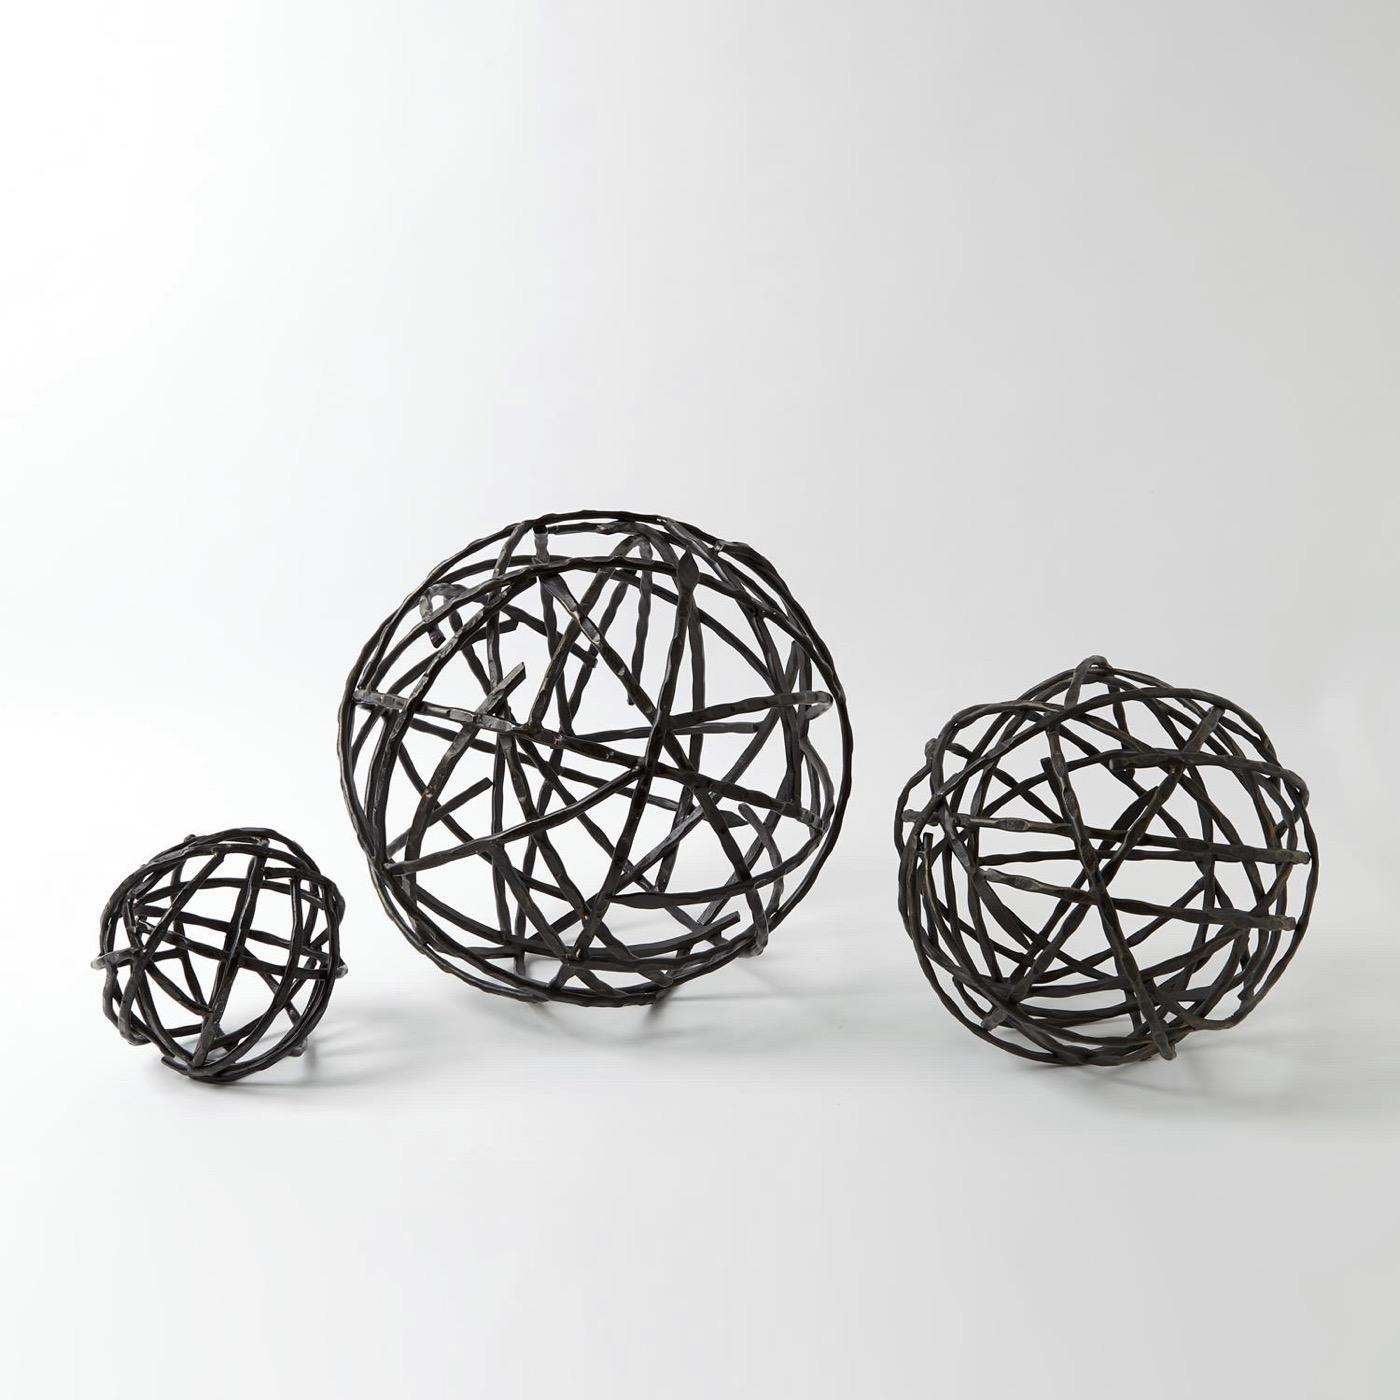 Stratosphere Sculptures